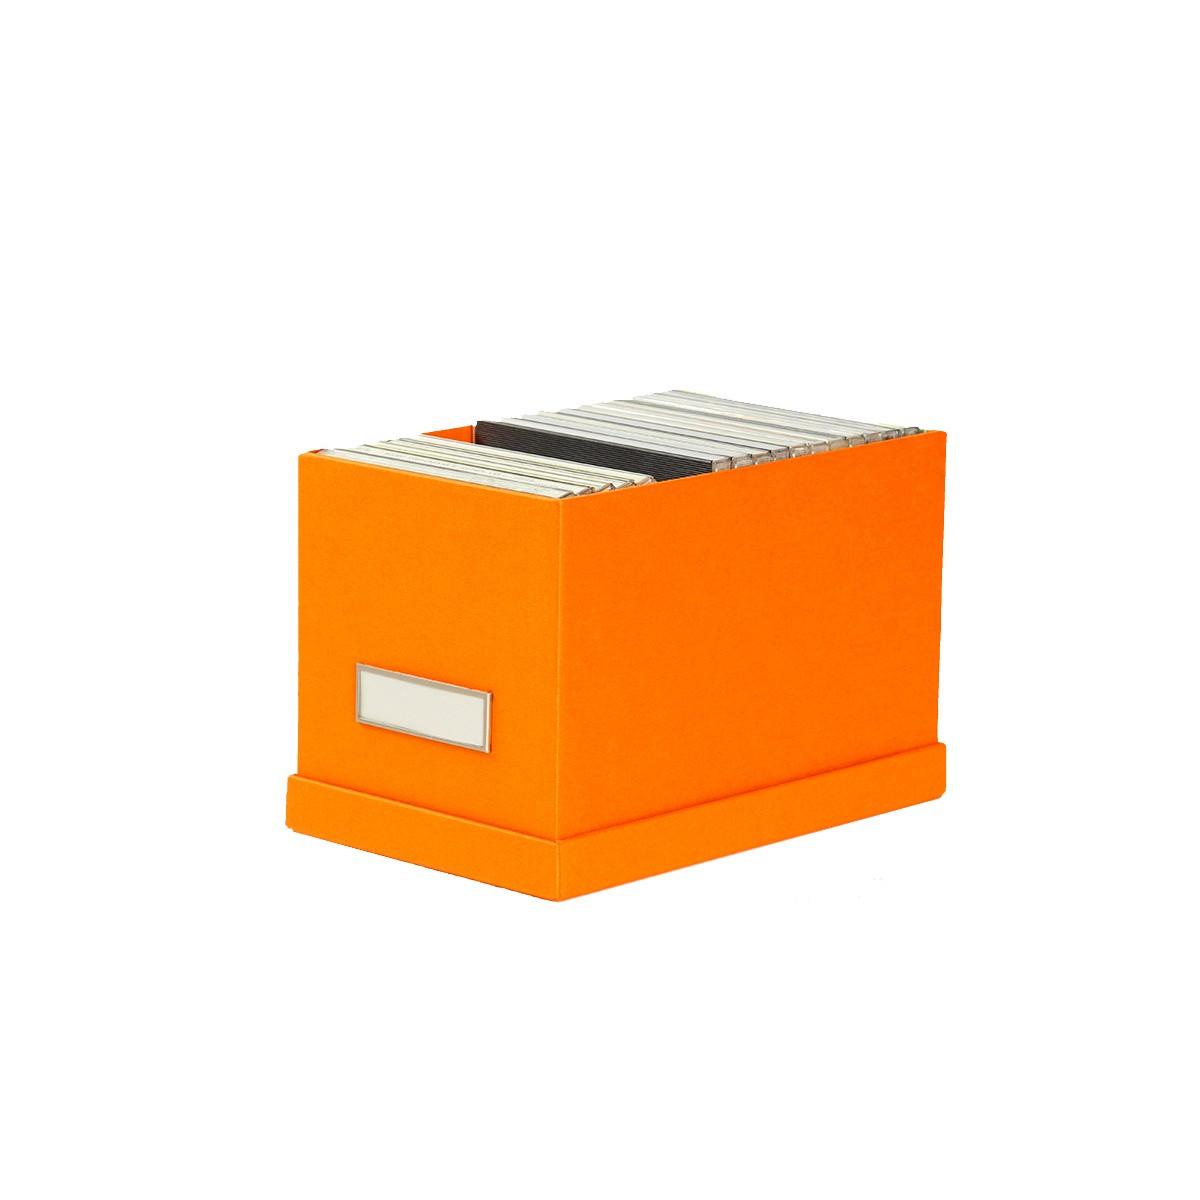 bo te de rangement cd en carton orange. Black Bedroom Furniture Sets. Home Design Ideas